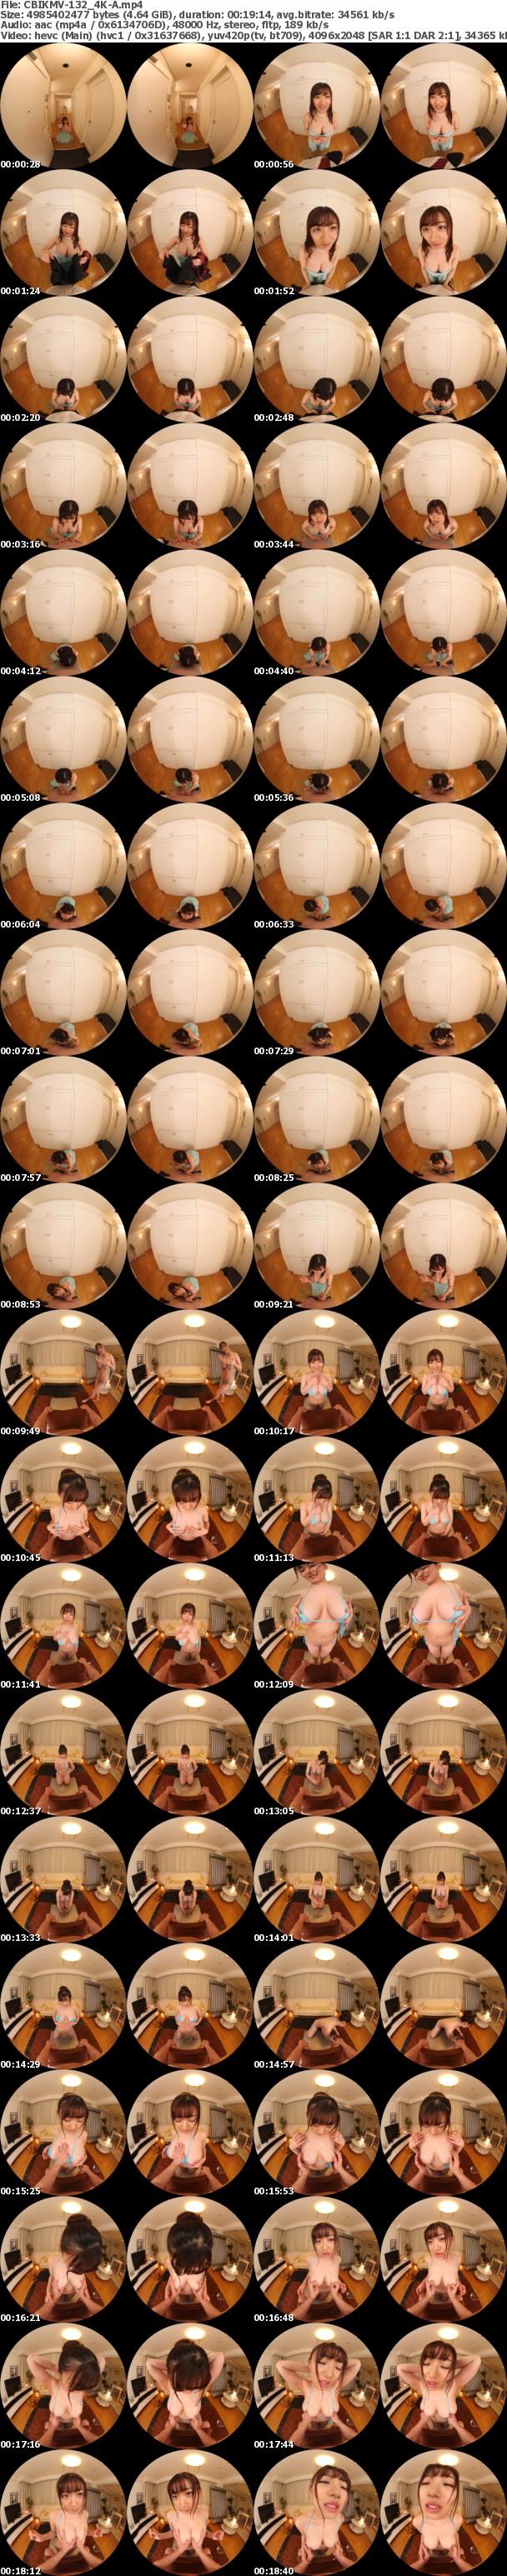 (VR) (4K) CBIKMV-132 兄に心底恋焦がれる妹が自宅ソープランドOPEN!! 成長しすぎたもっちもちおっぱいで快楽エスコート 小梅えな